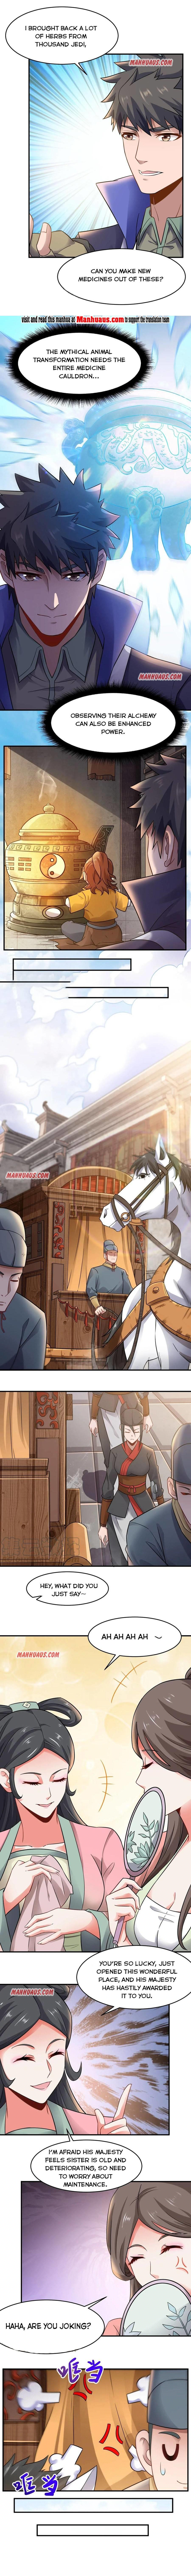 Yuanlong Chapter 159 page 2 - Mangakakalots.com